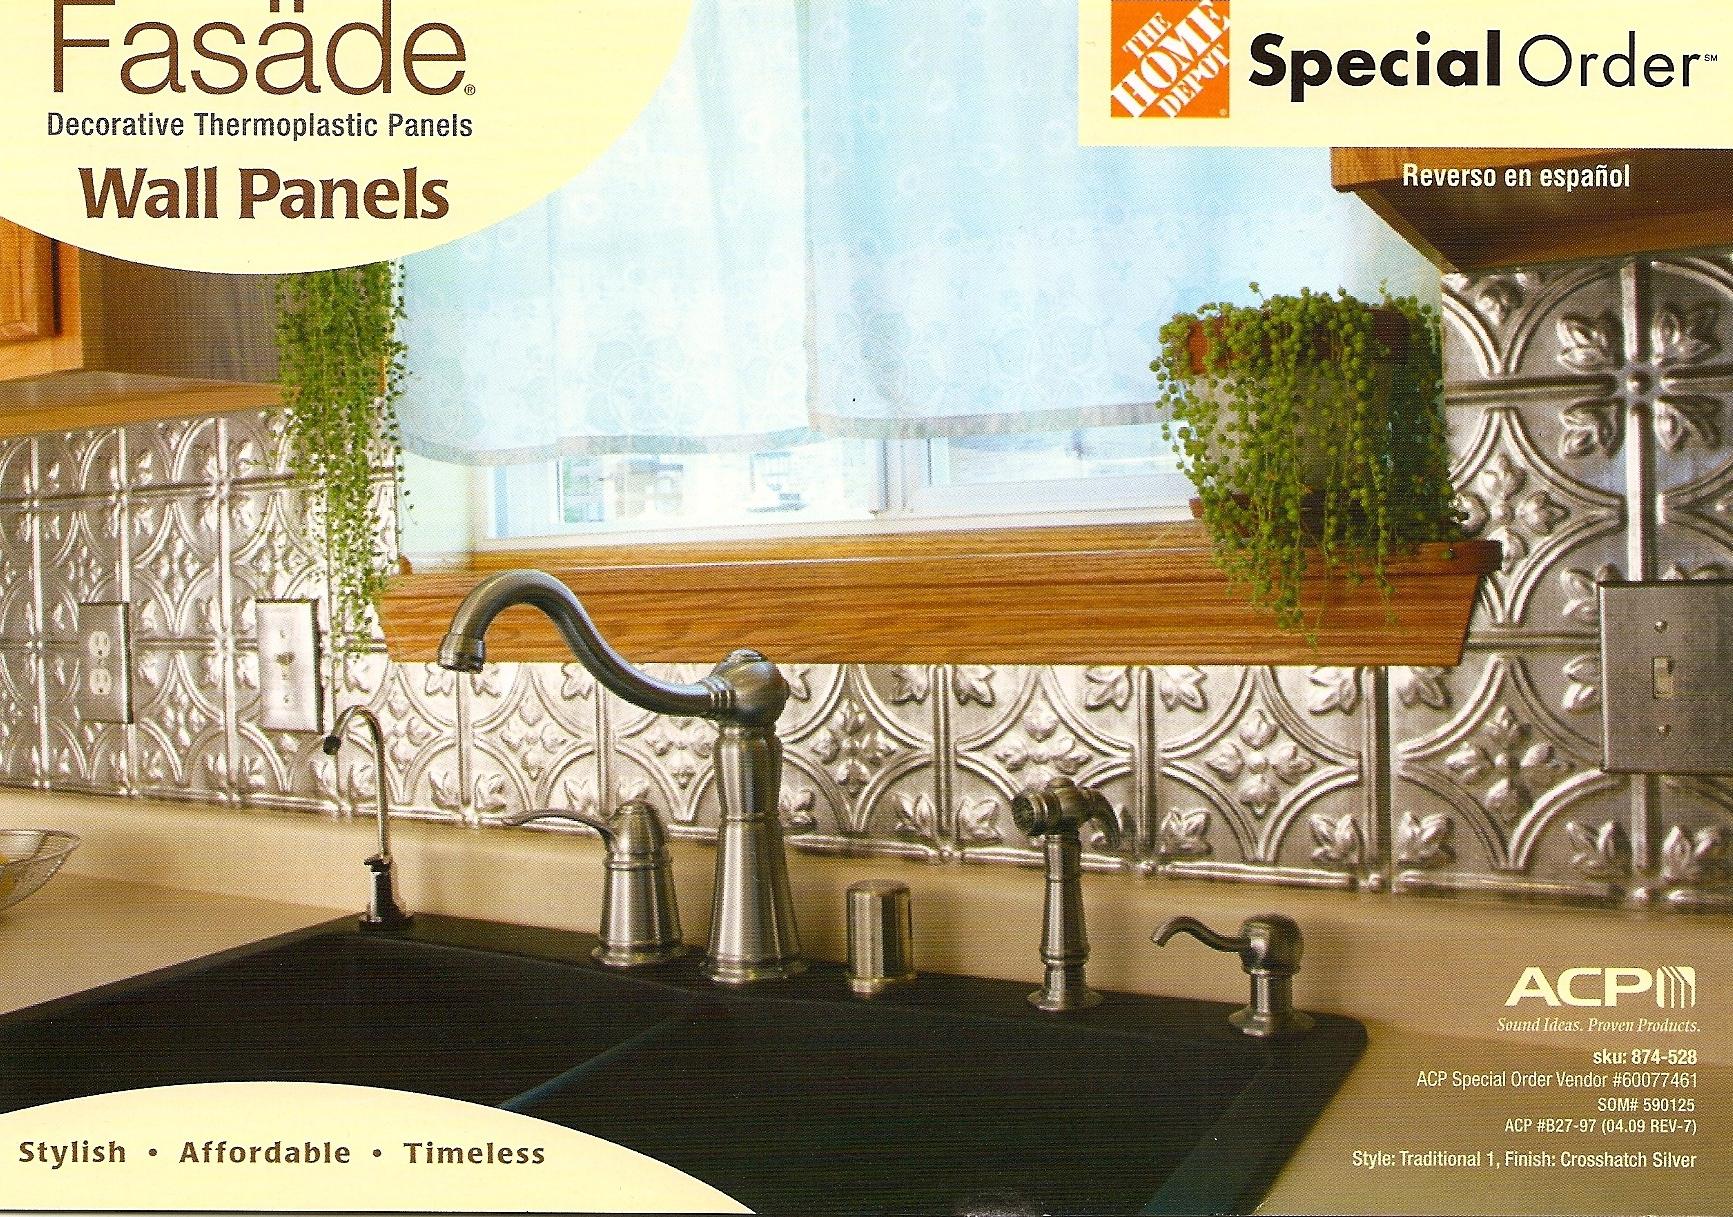 Fasade decorative wall panels or bedazzling moms kitchen becolorful facade wall panels dailygadgetfo Choice Image